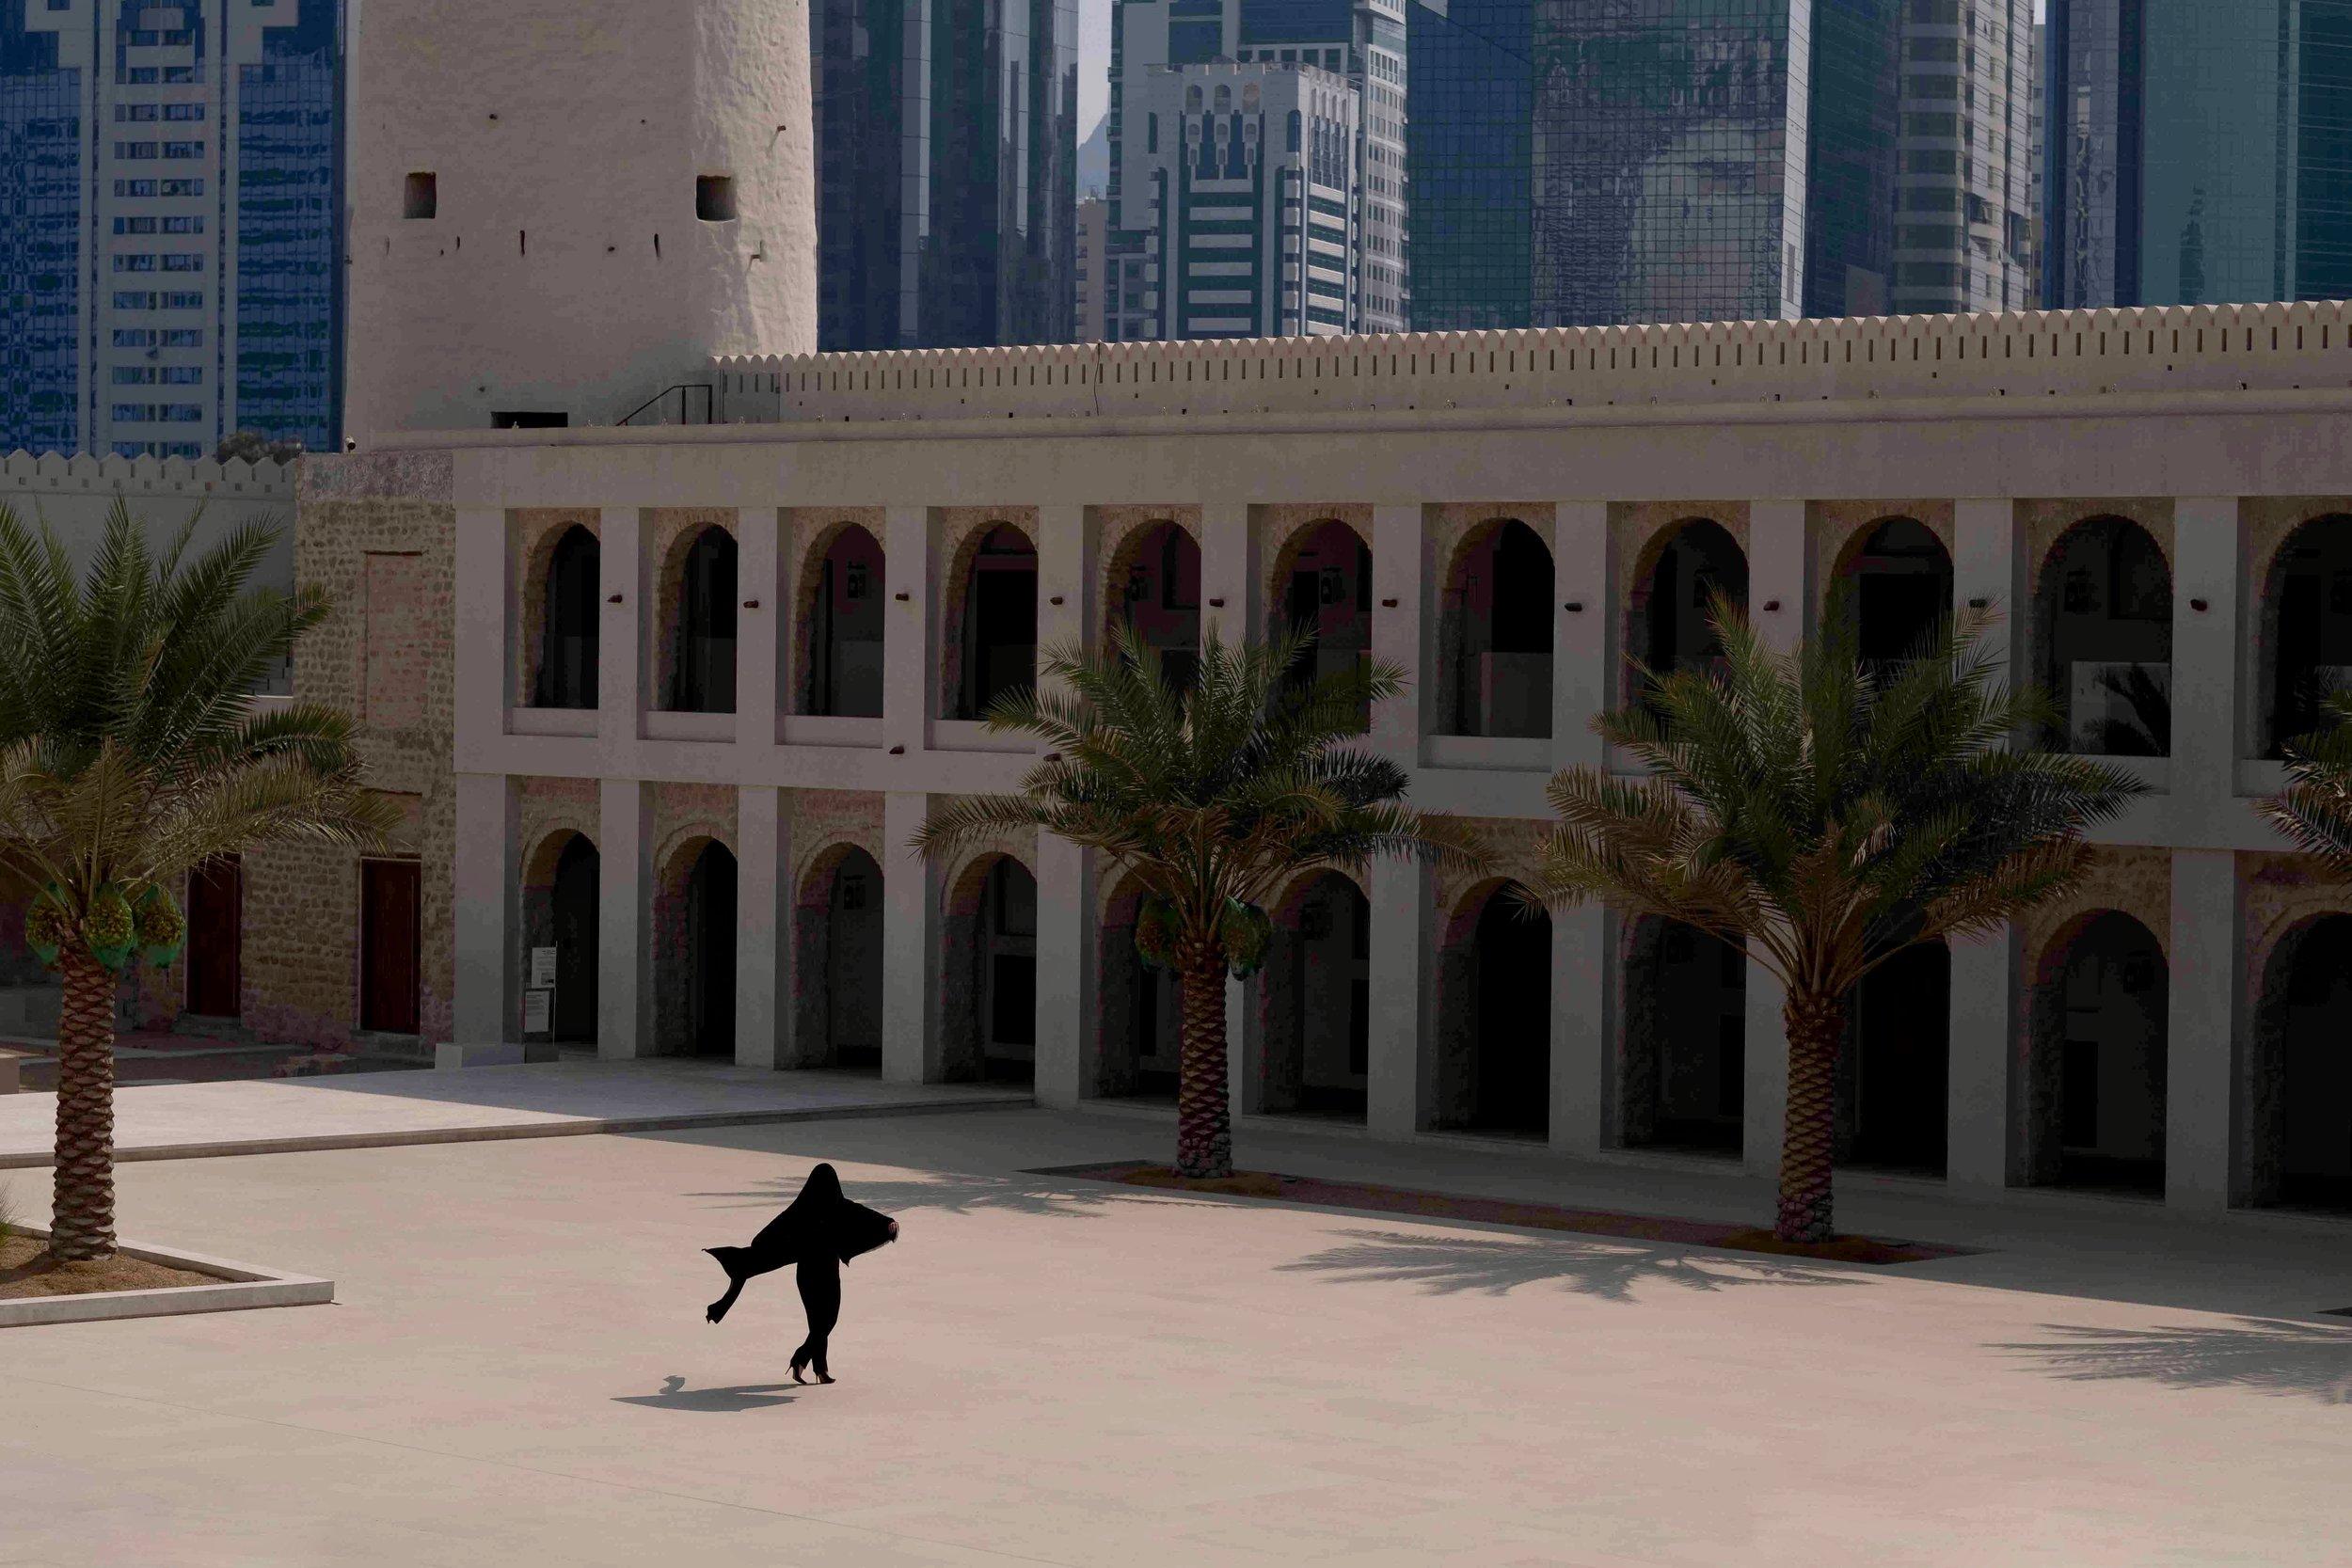 QASR AL HOSN • ABU DHABI, UAE PHOTOGRAPHER: ALJOHN NOVA